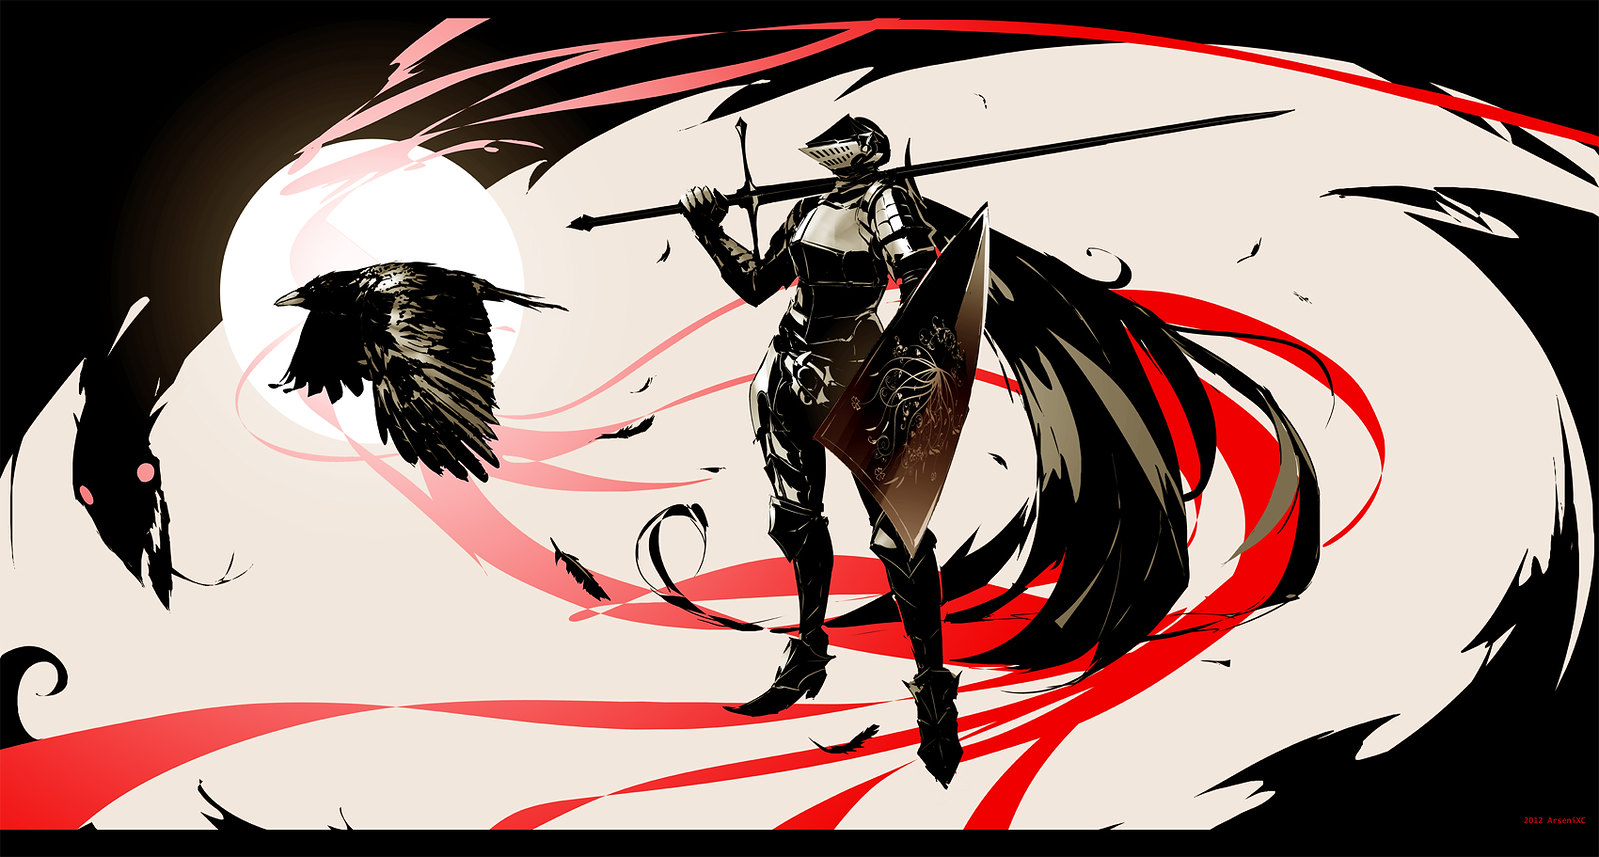 Dark Souls Image Thread 8169725653_377c36a935_h